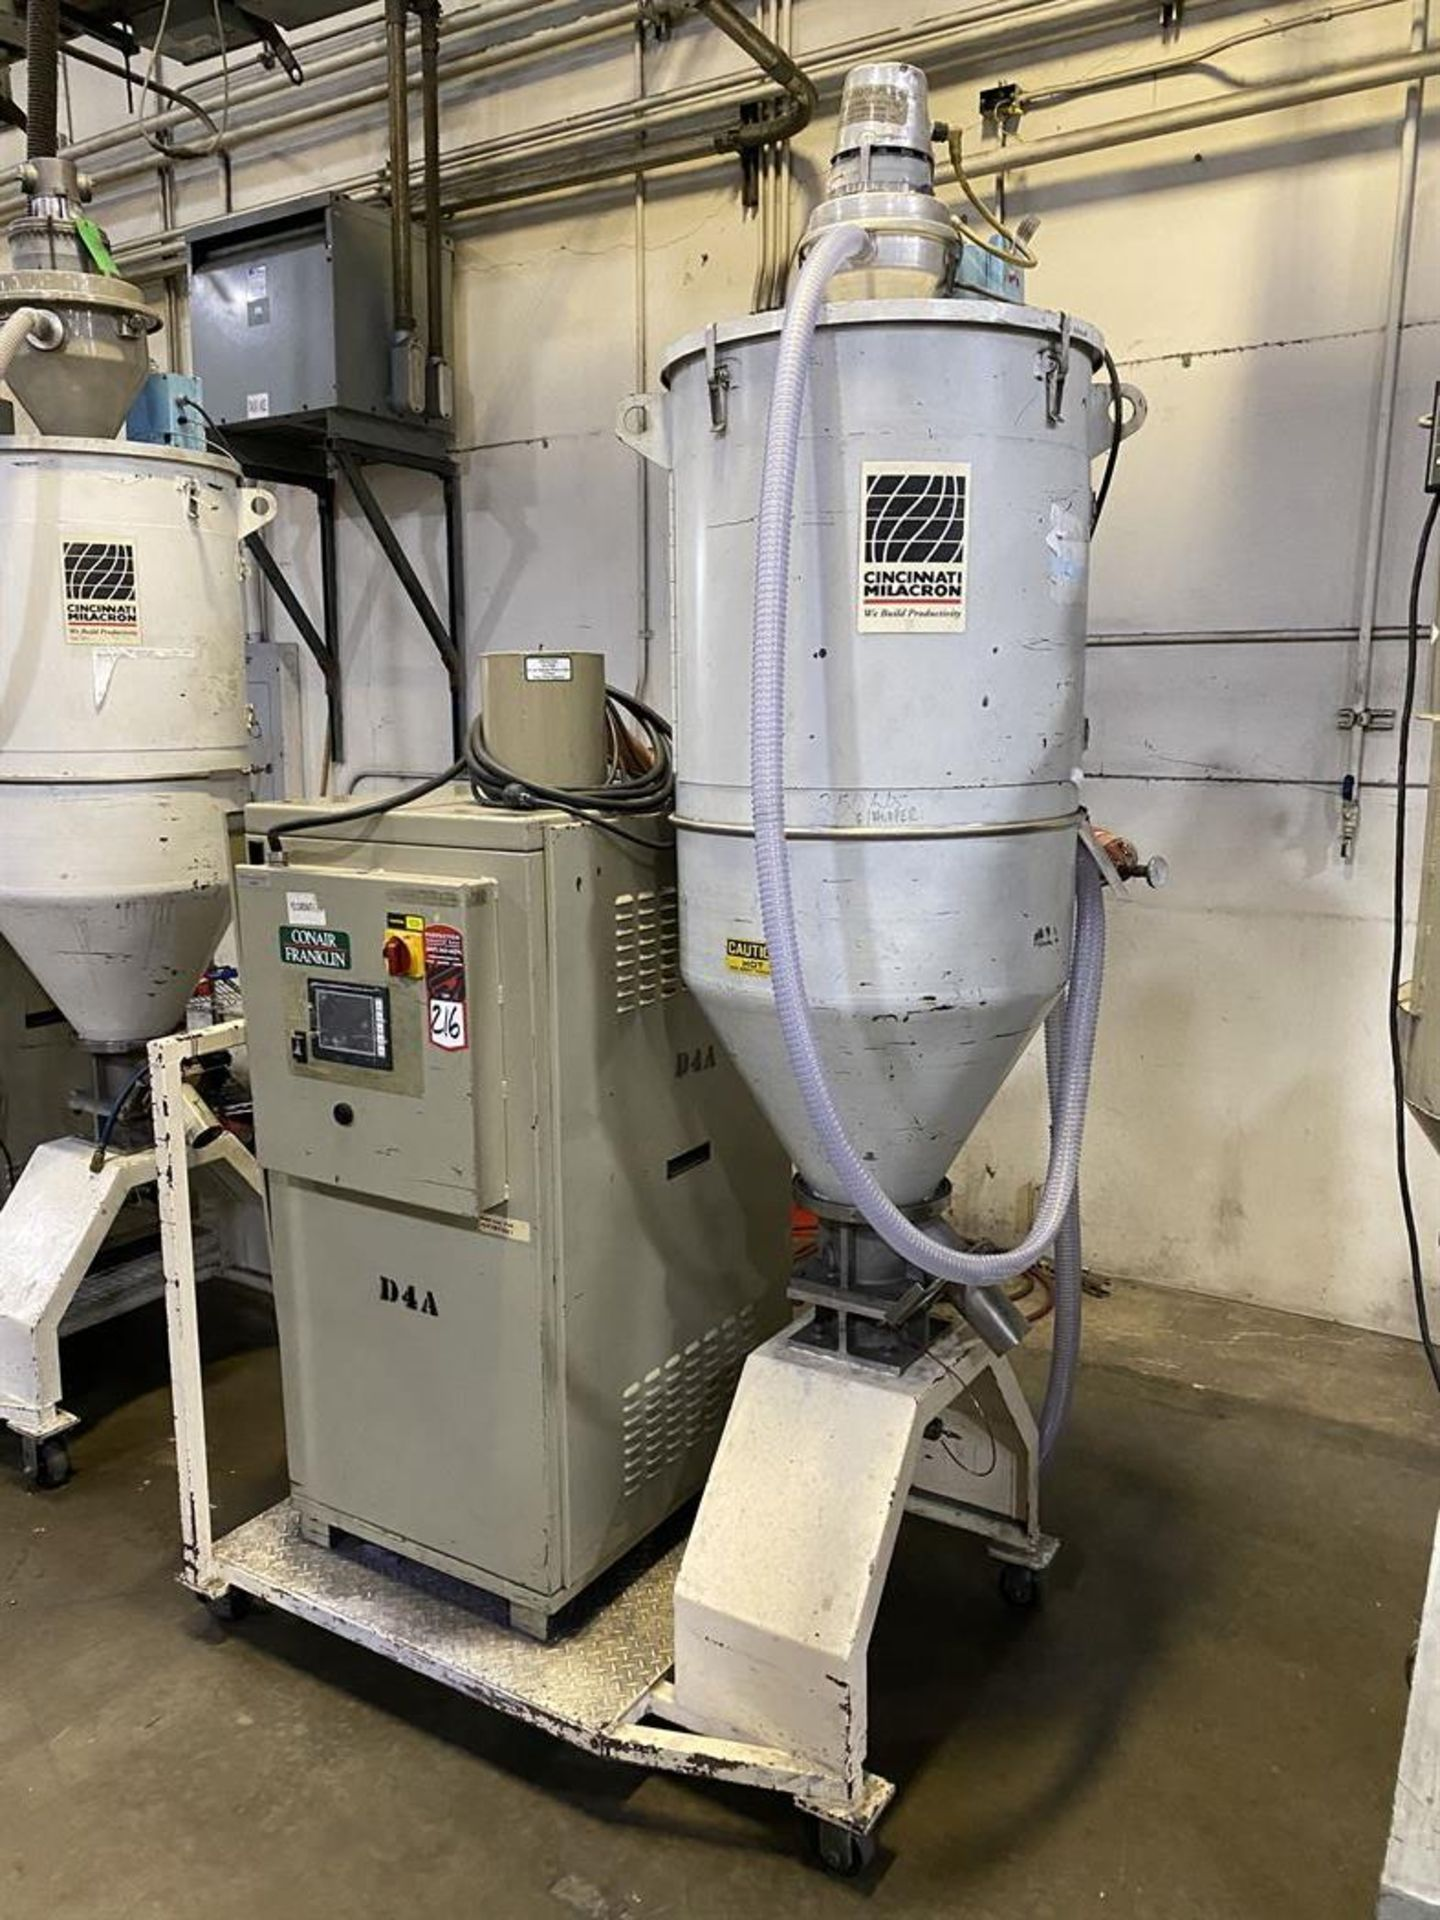 Lot 216 - Conair Franklin DBAA04S030000 Hopper Dryer System, s/n D51083, Cincinnati Milacron Hopper, Vacuum